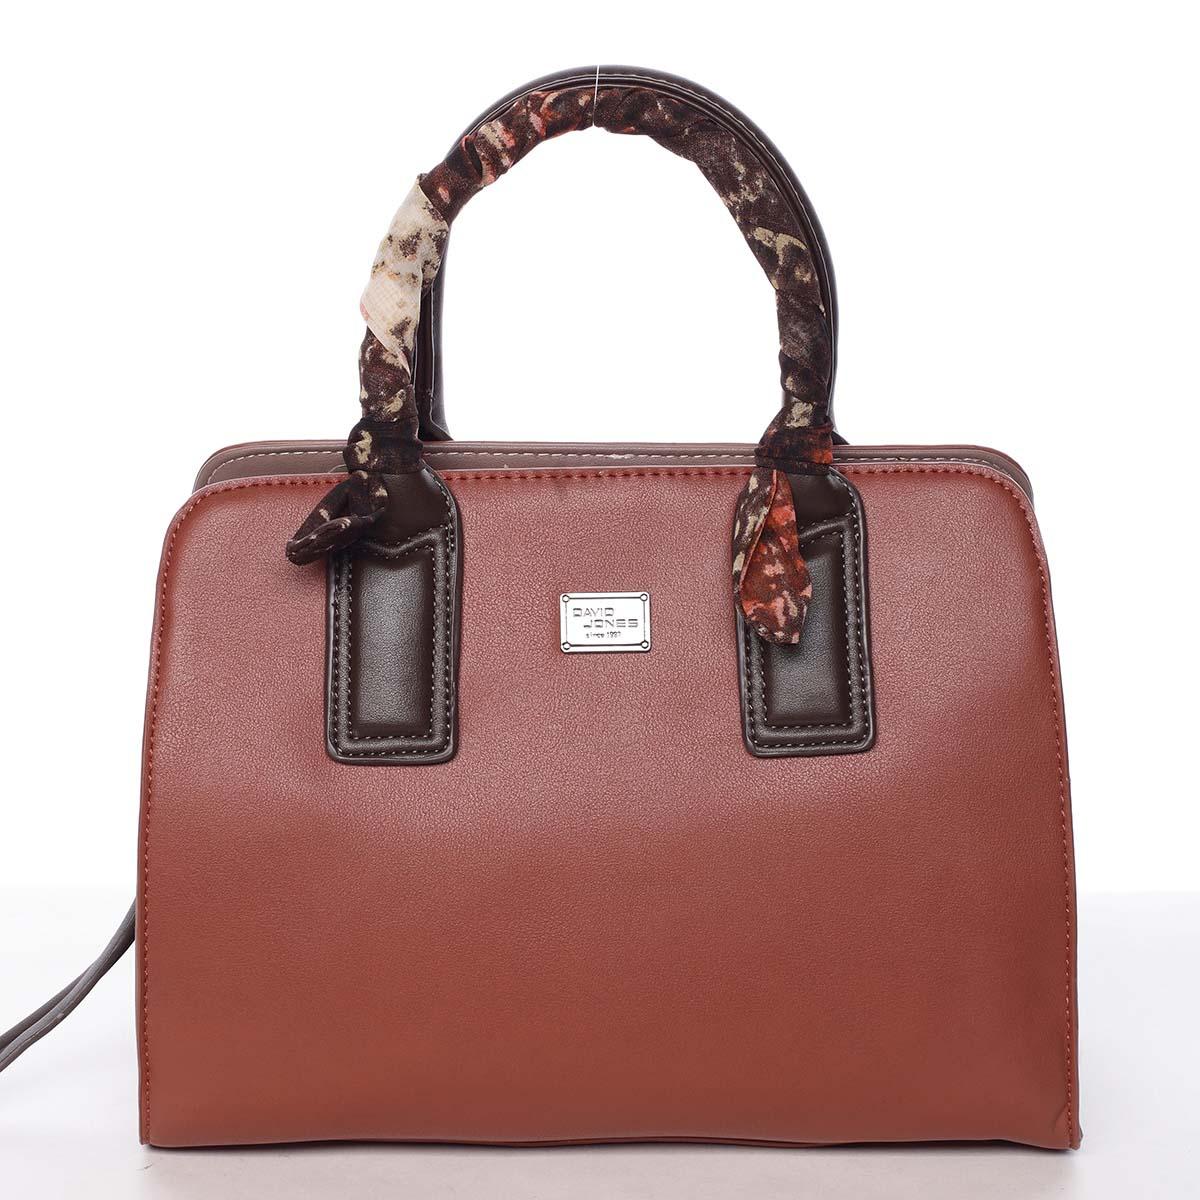 Štýlová trendy dámska kabelka do ruky karamelovo červená - David Jones Crescent červená